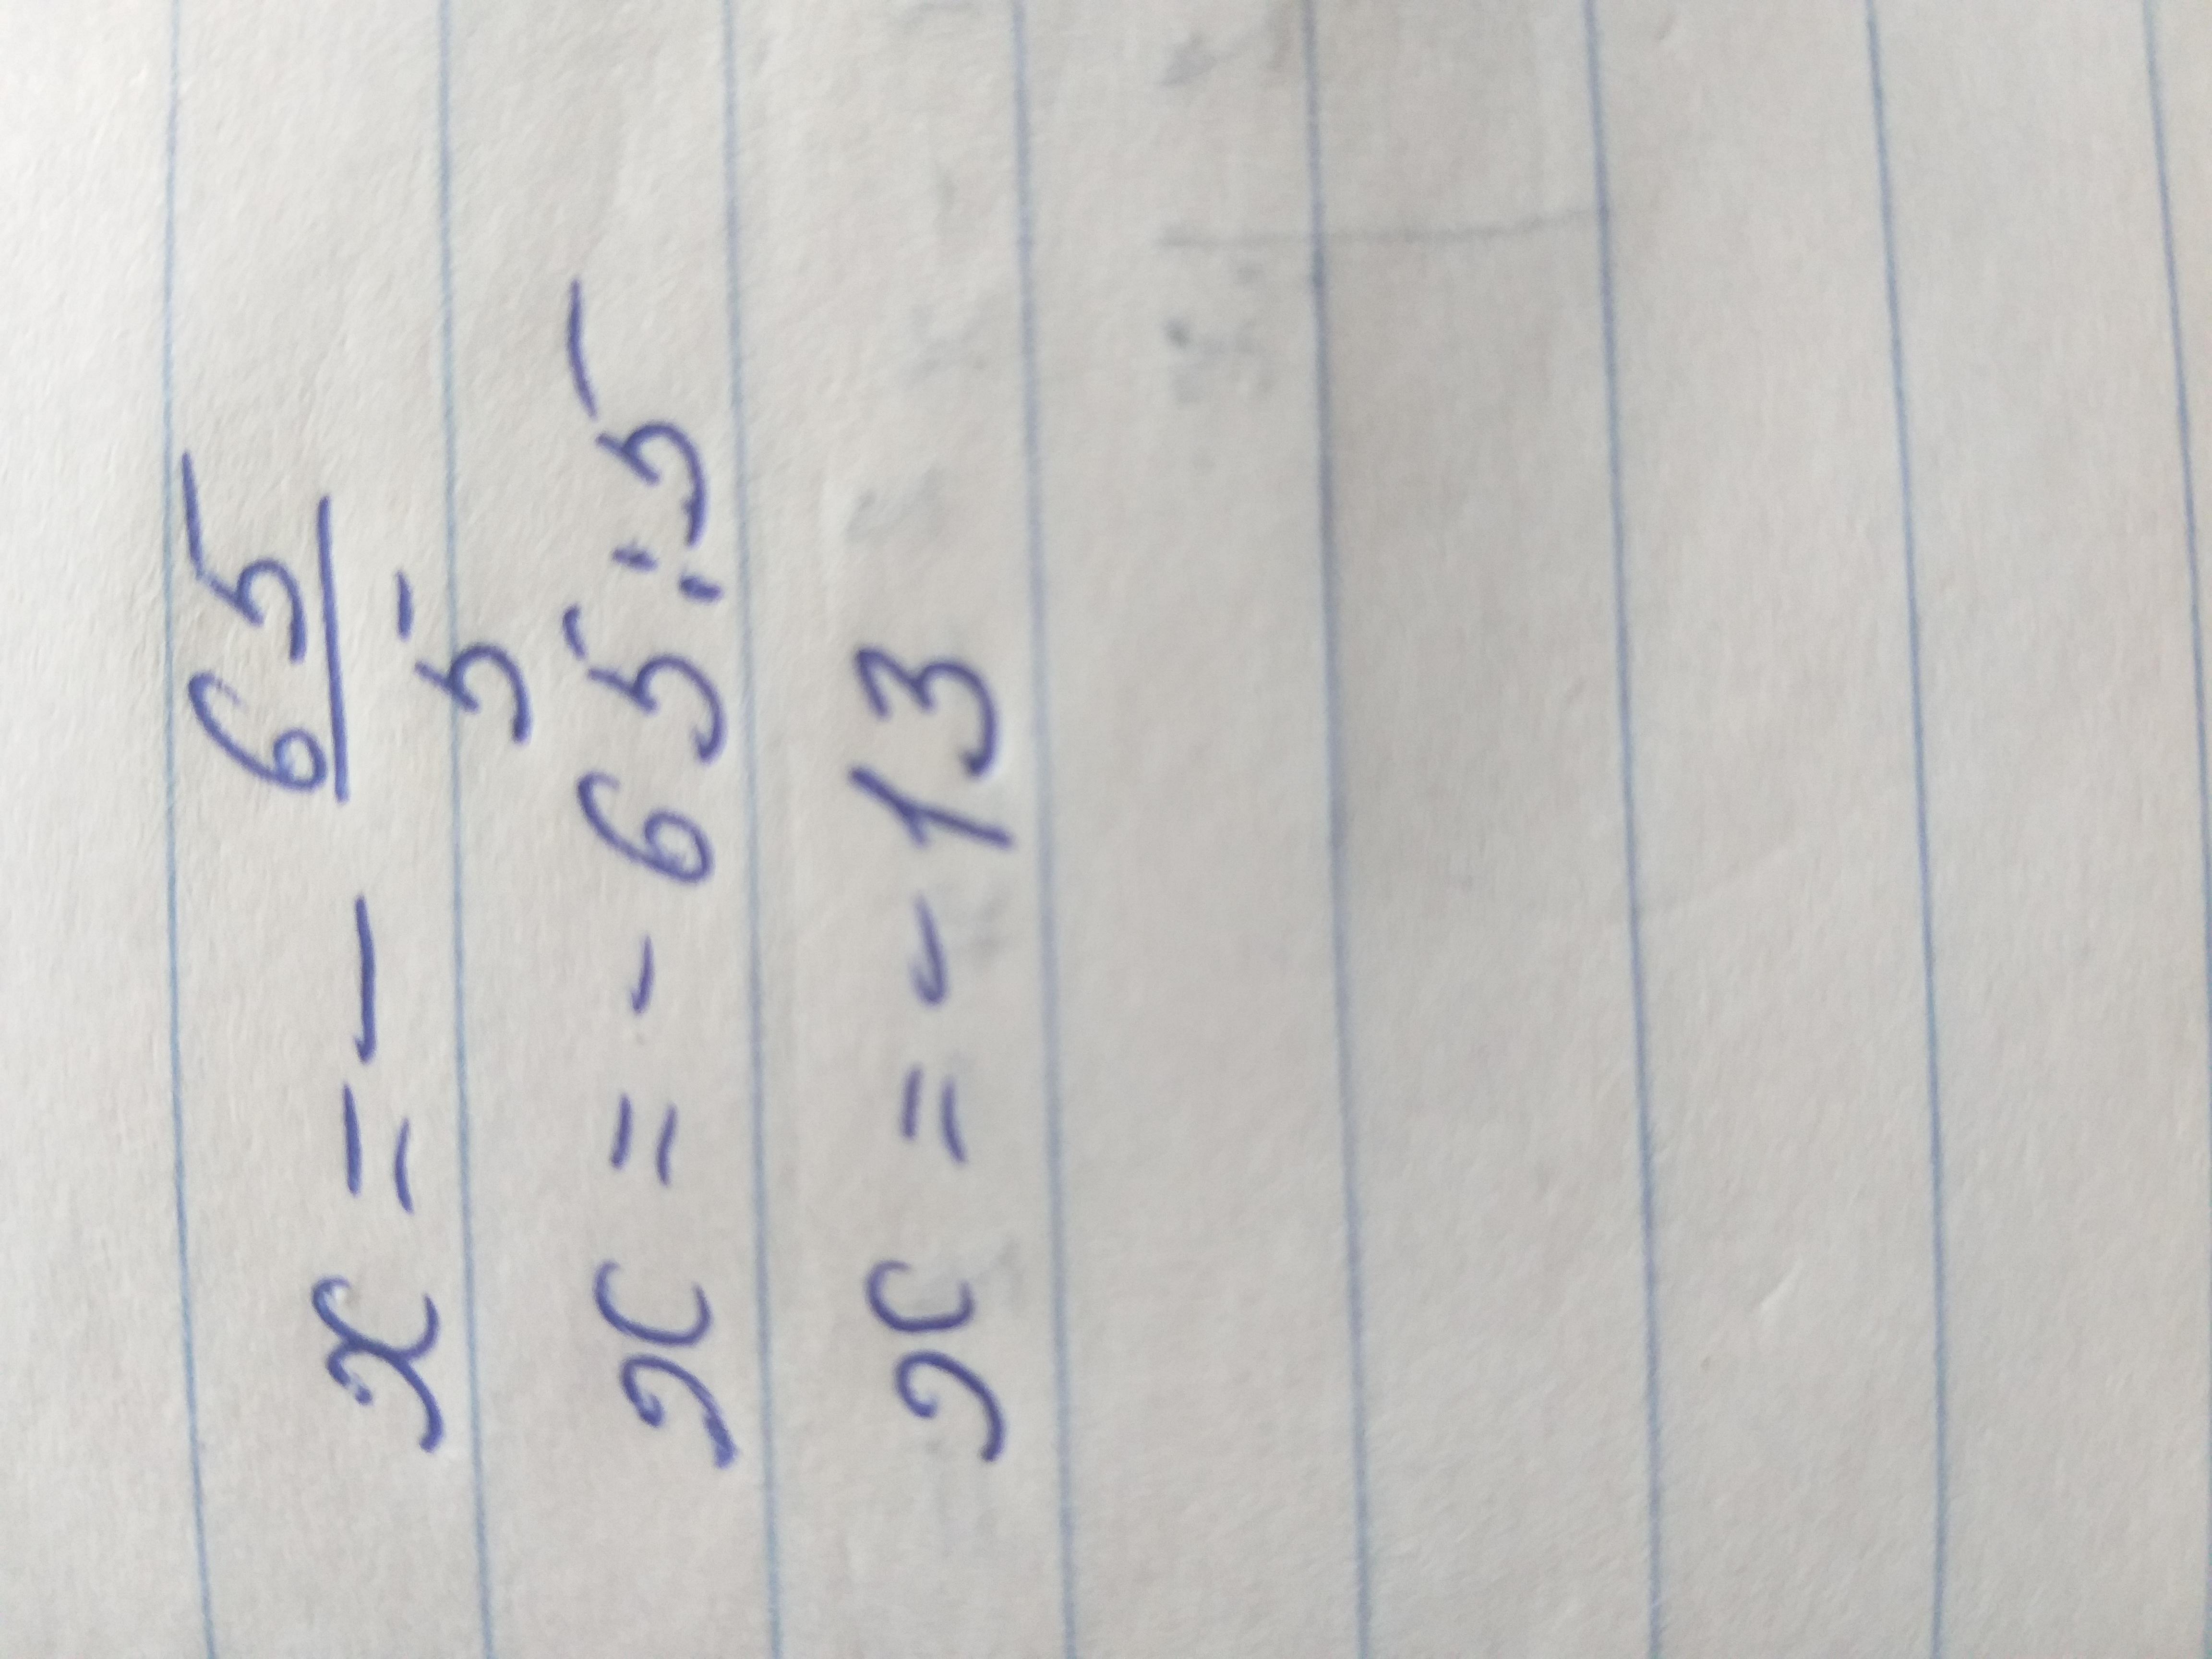 Помогите найти корень уравнения x = - 65 / 5